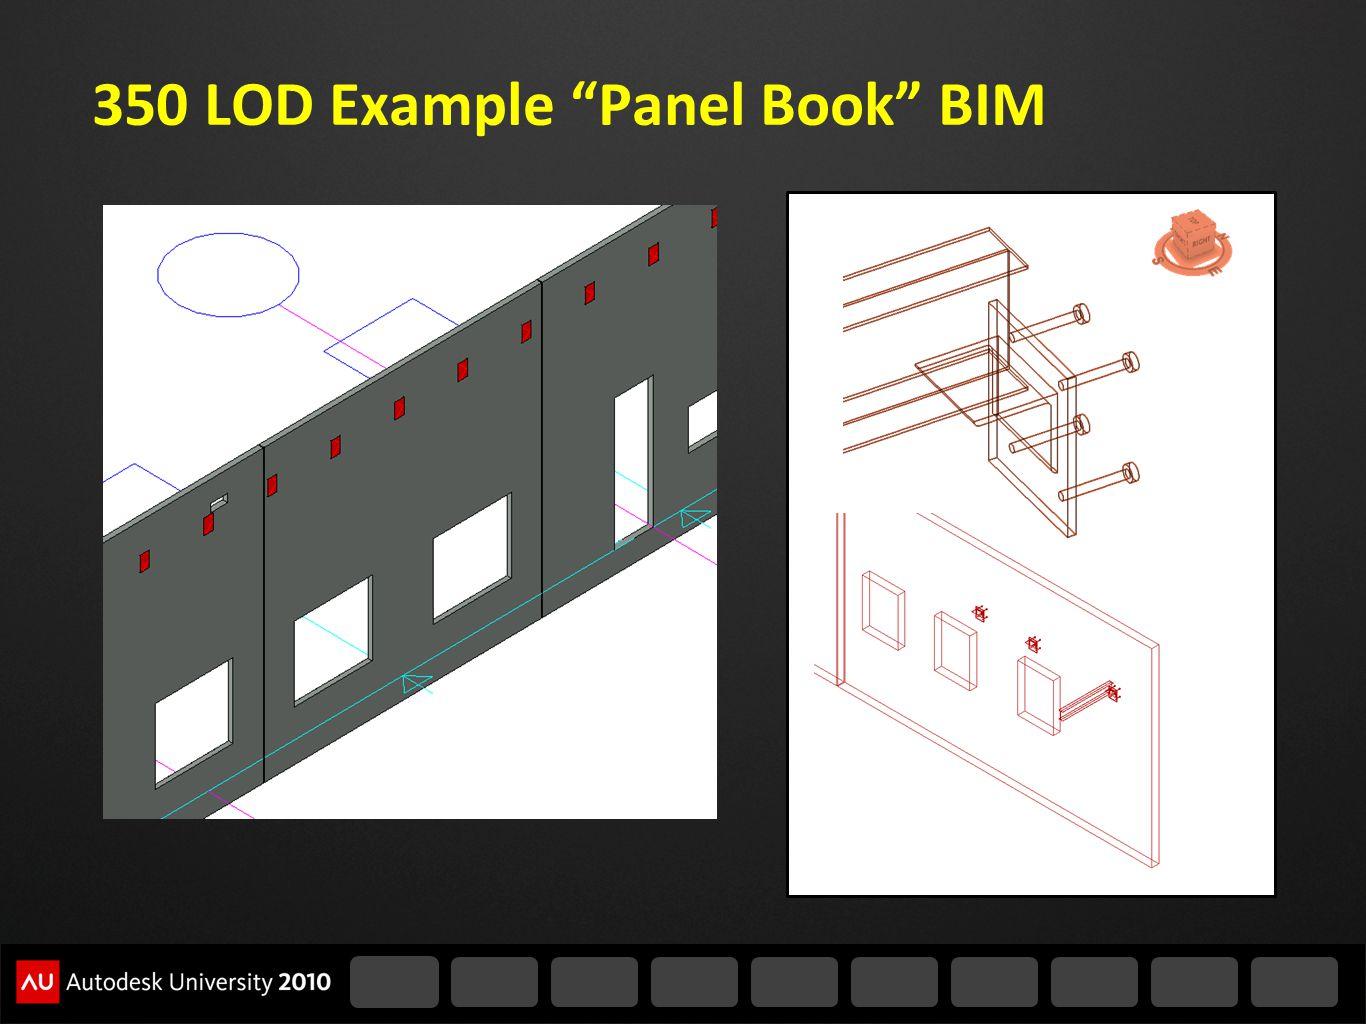 350 LOD Example Panel Book BIM